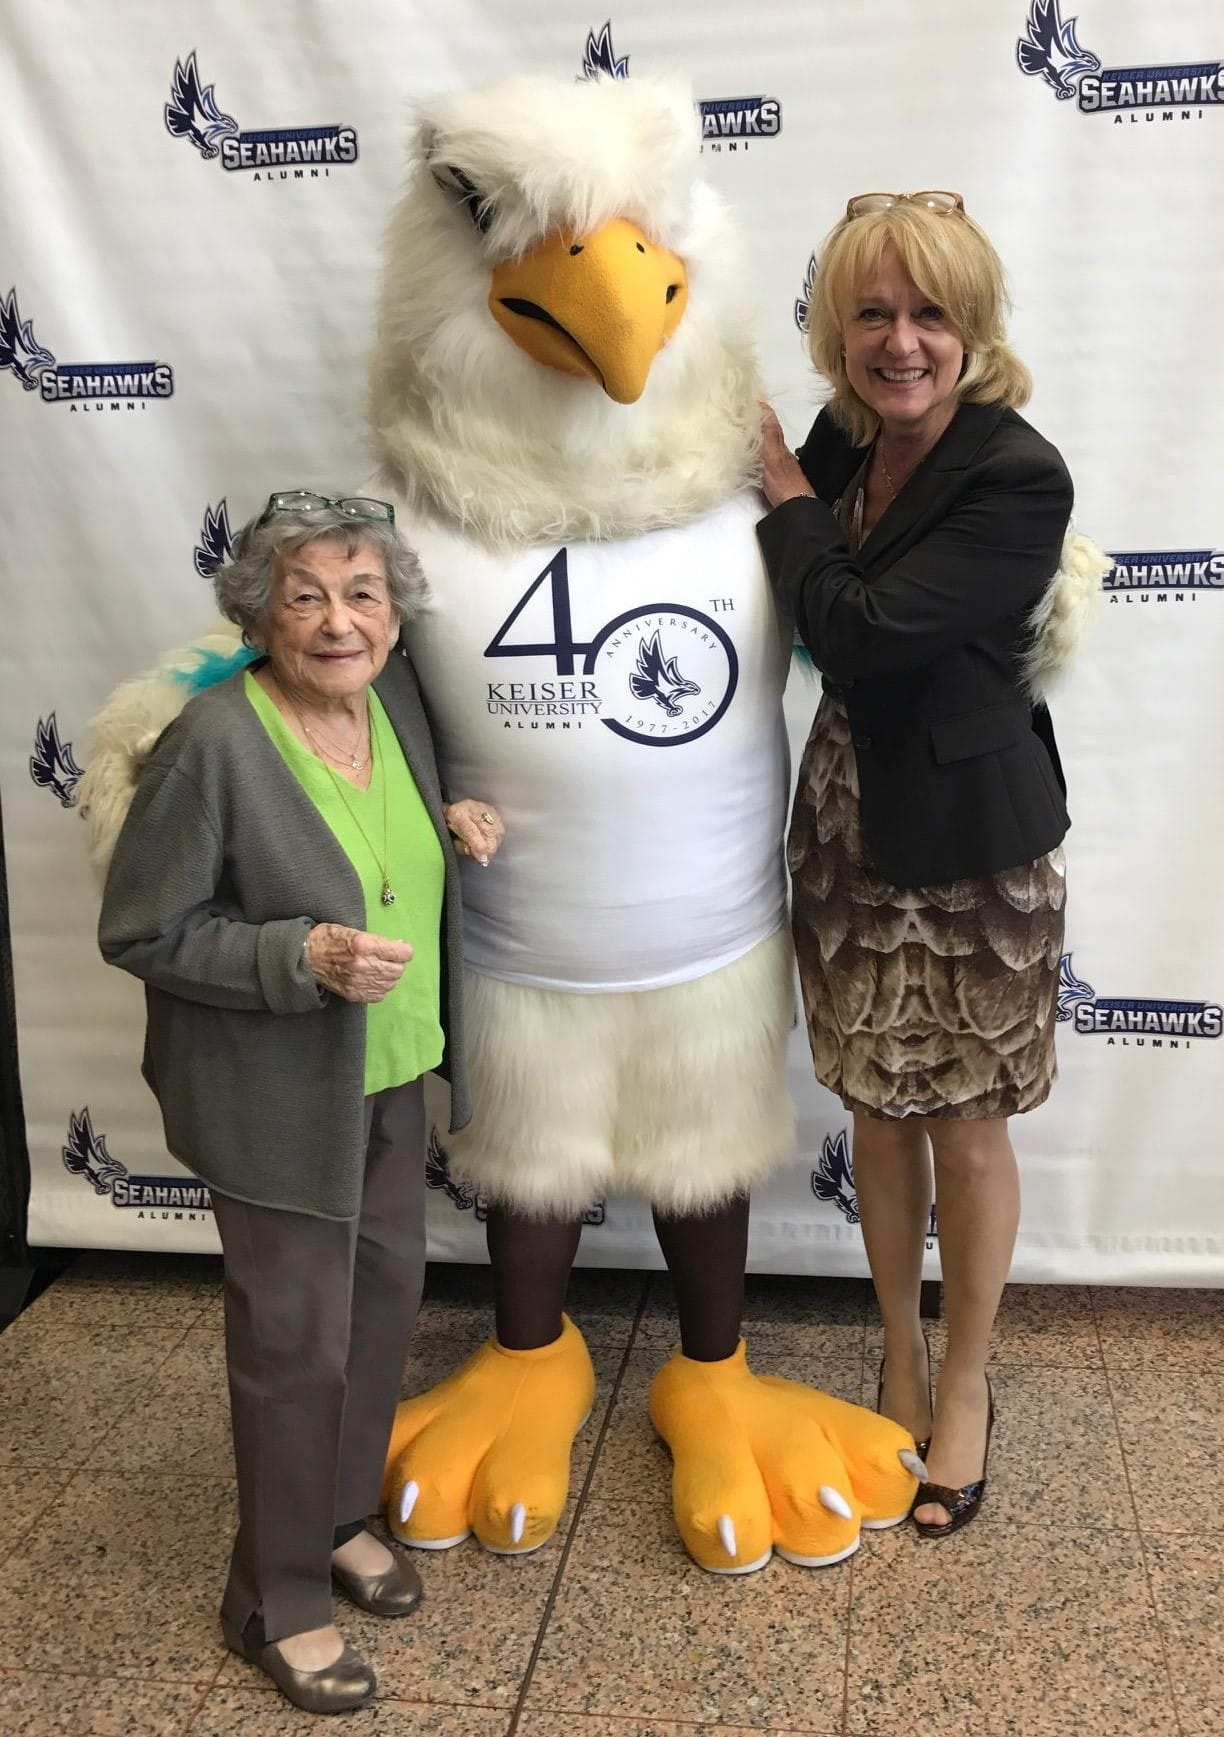 WOMEN'S HISTORY MONTH SPOTLIGHT: Rhonda Fuller, KU Ft. Lauderdale Campus President